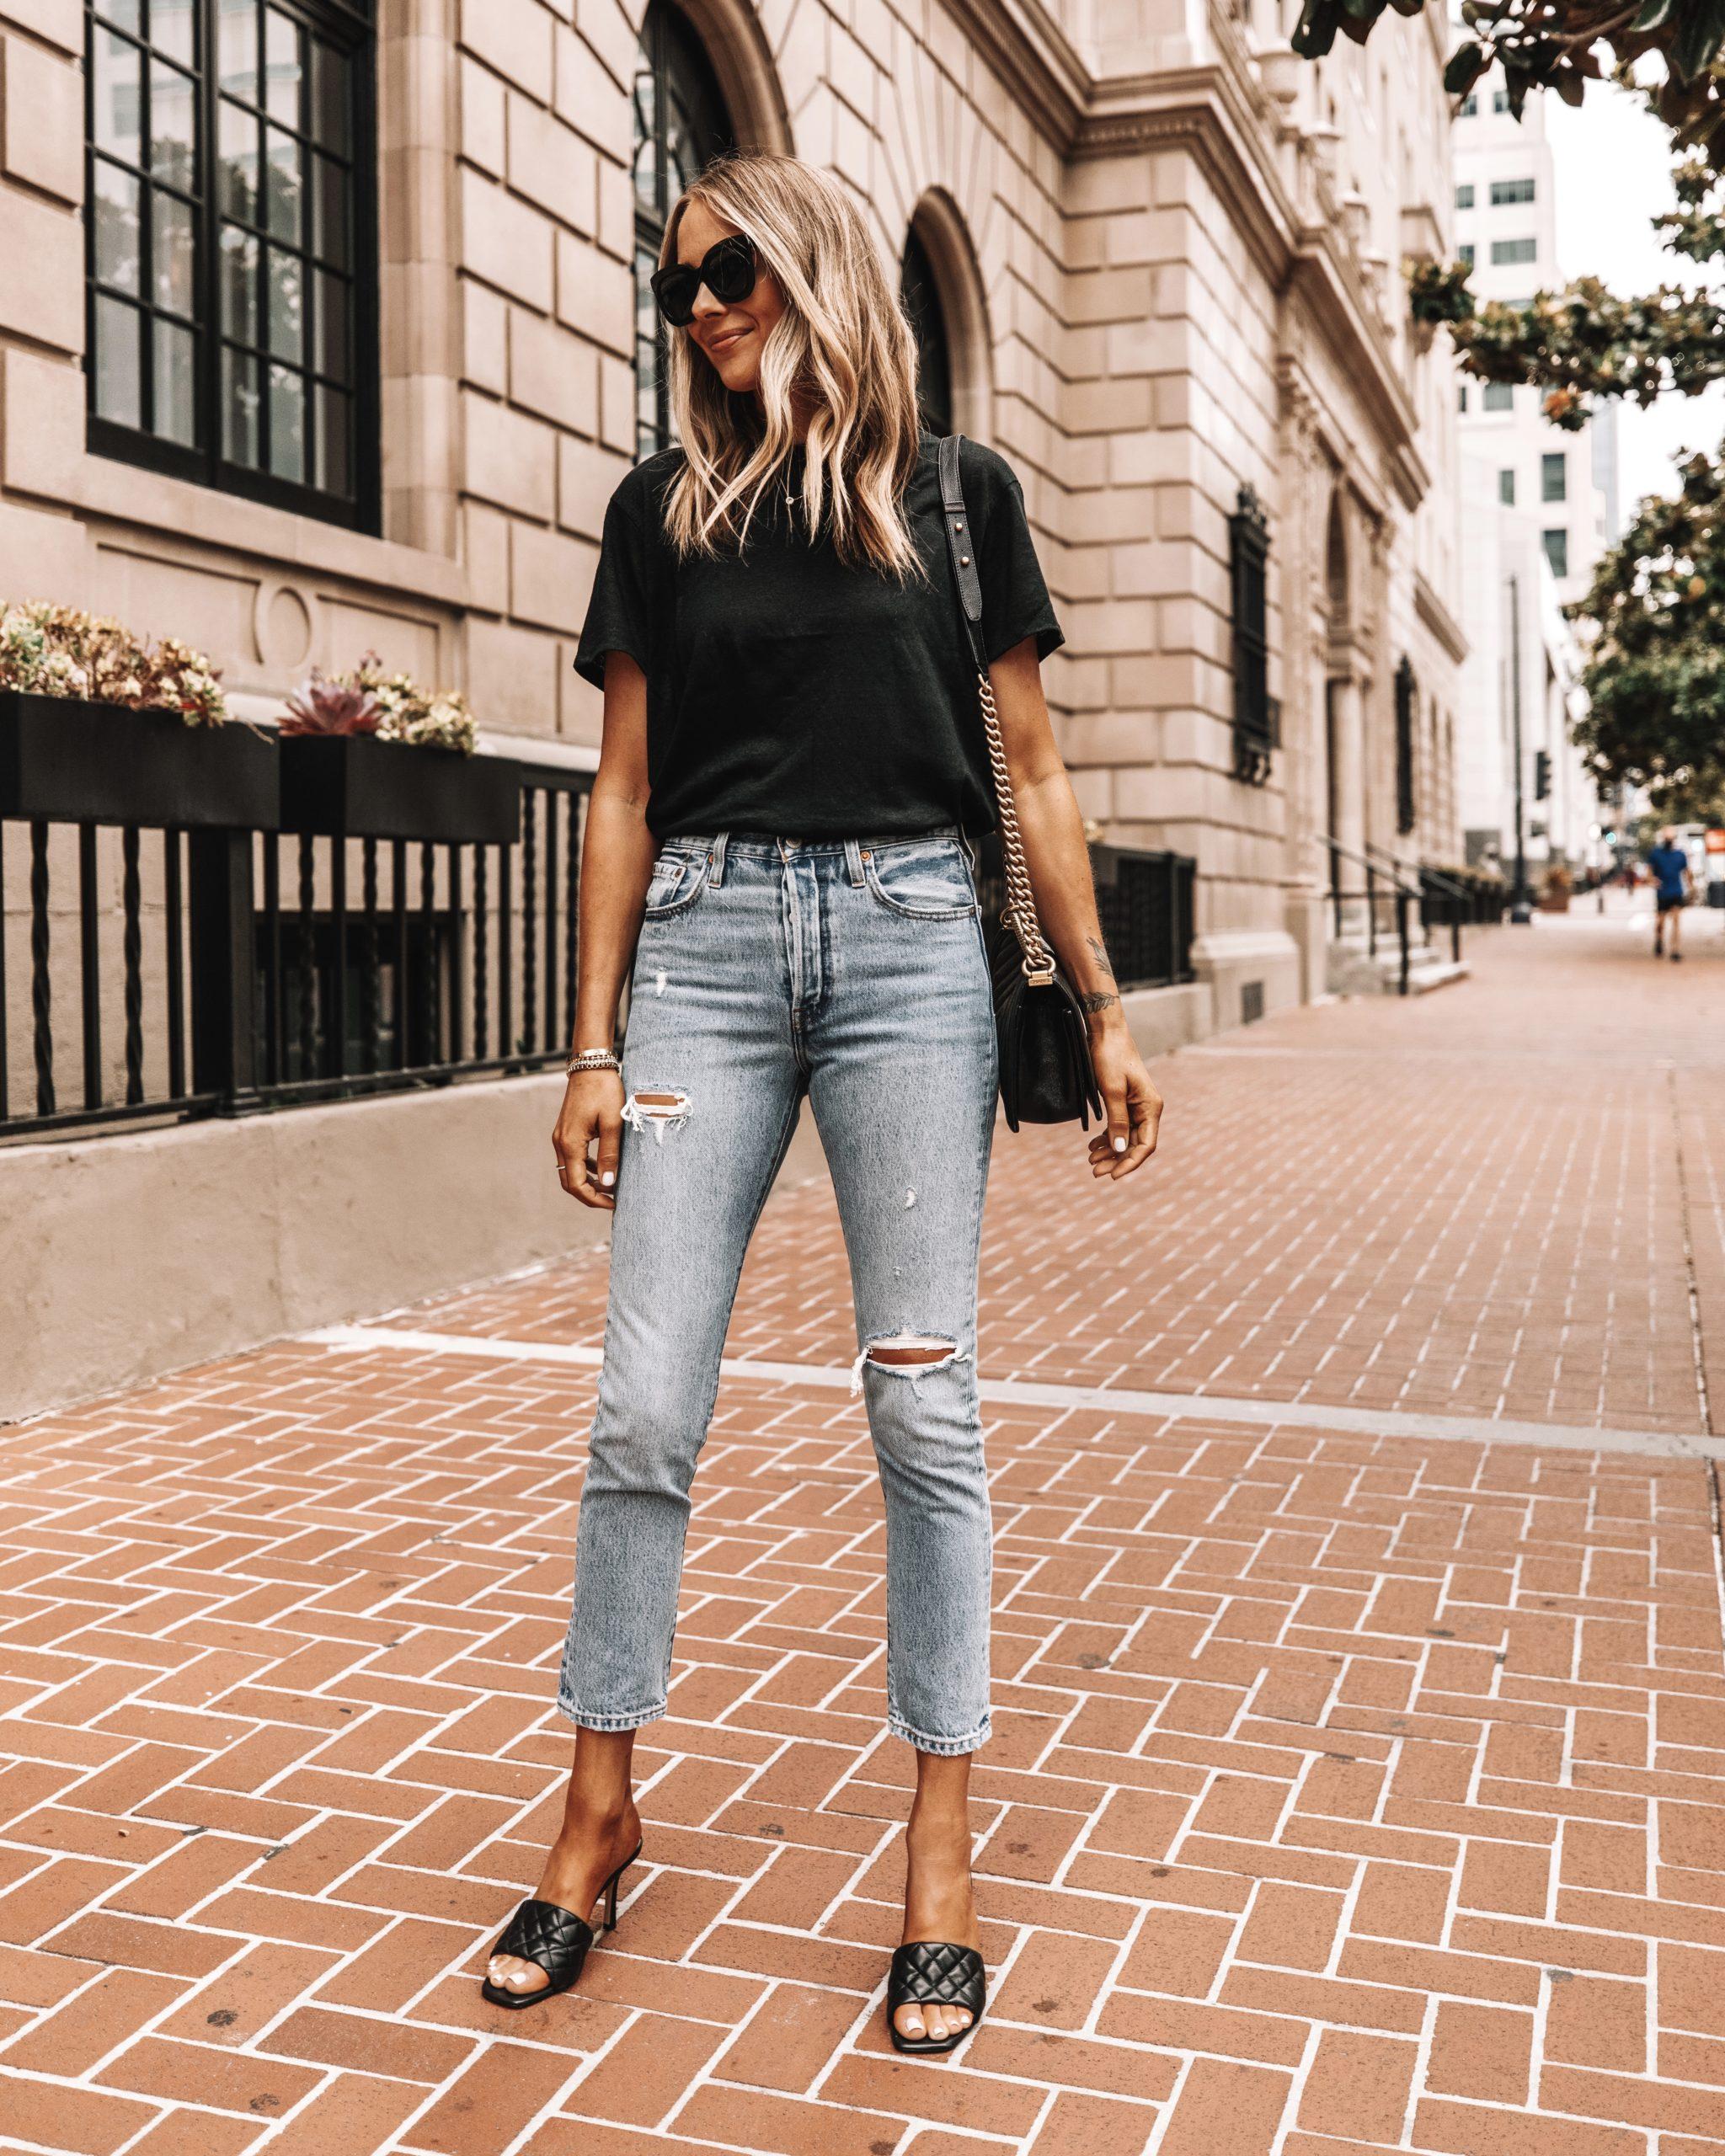 Fashion Jackson Wearing Anine Bing Black Tshirt Levis Ripped Jeans Black Heeled Sandals